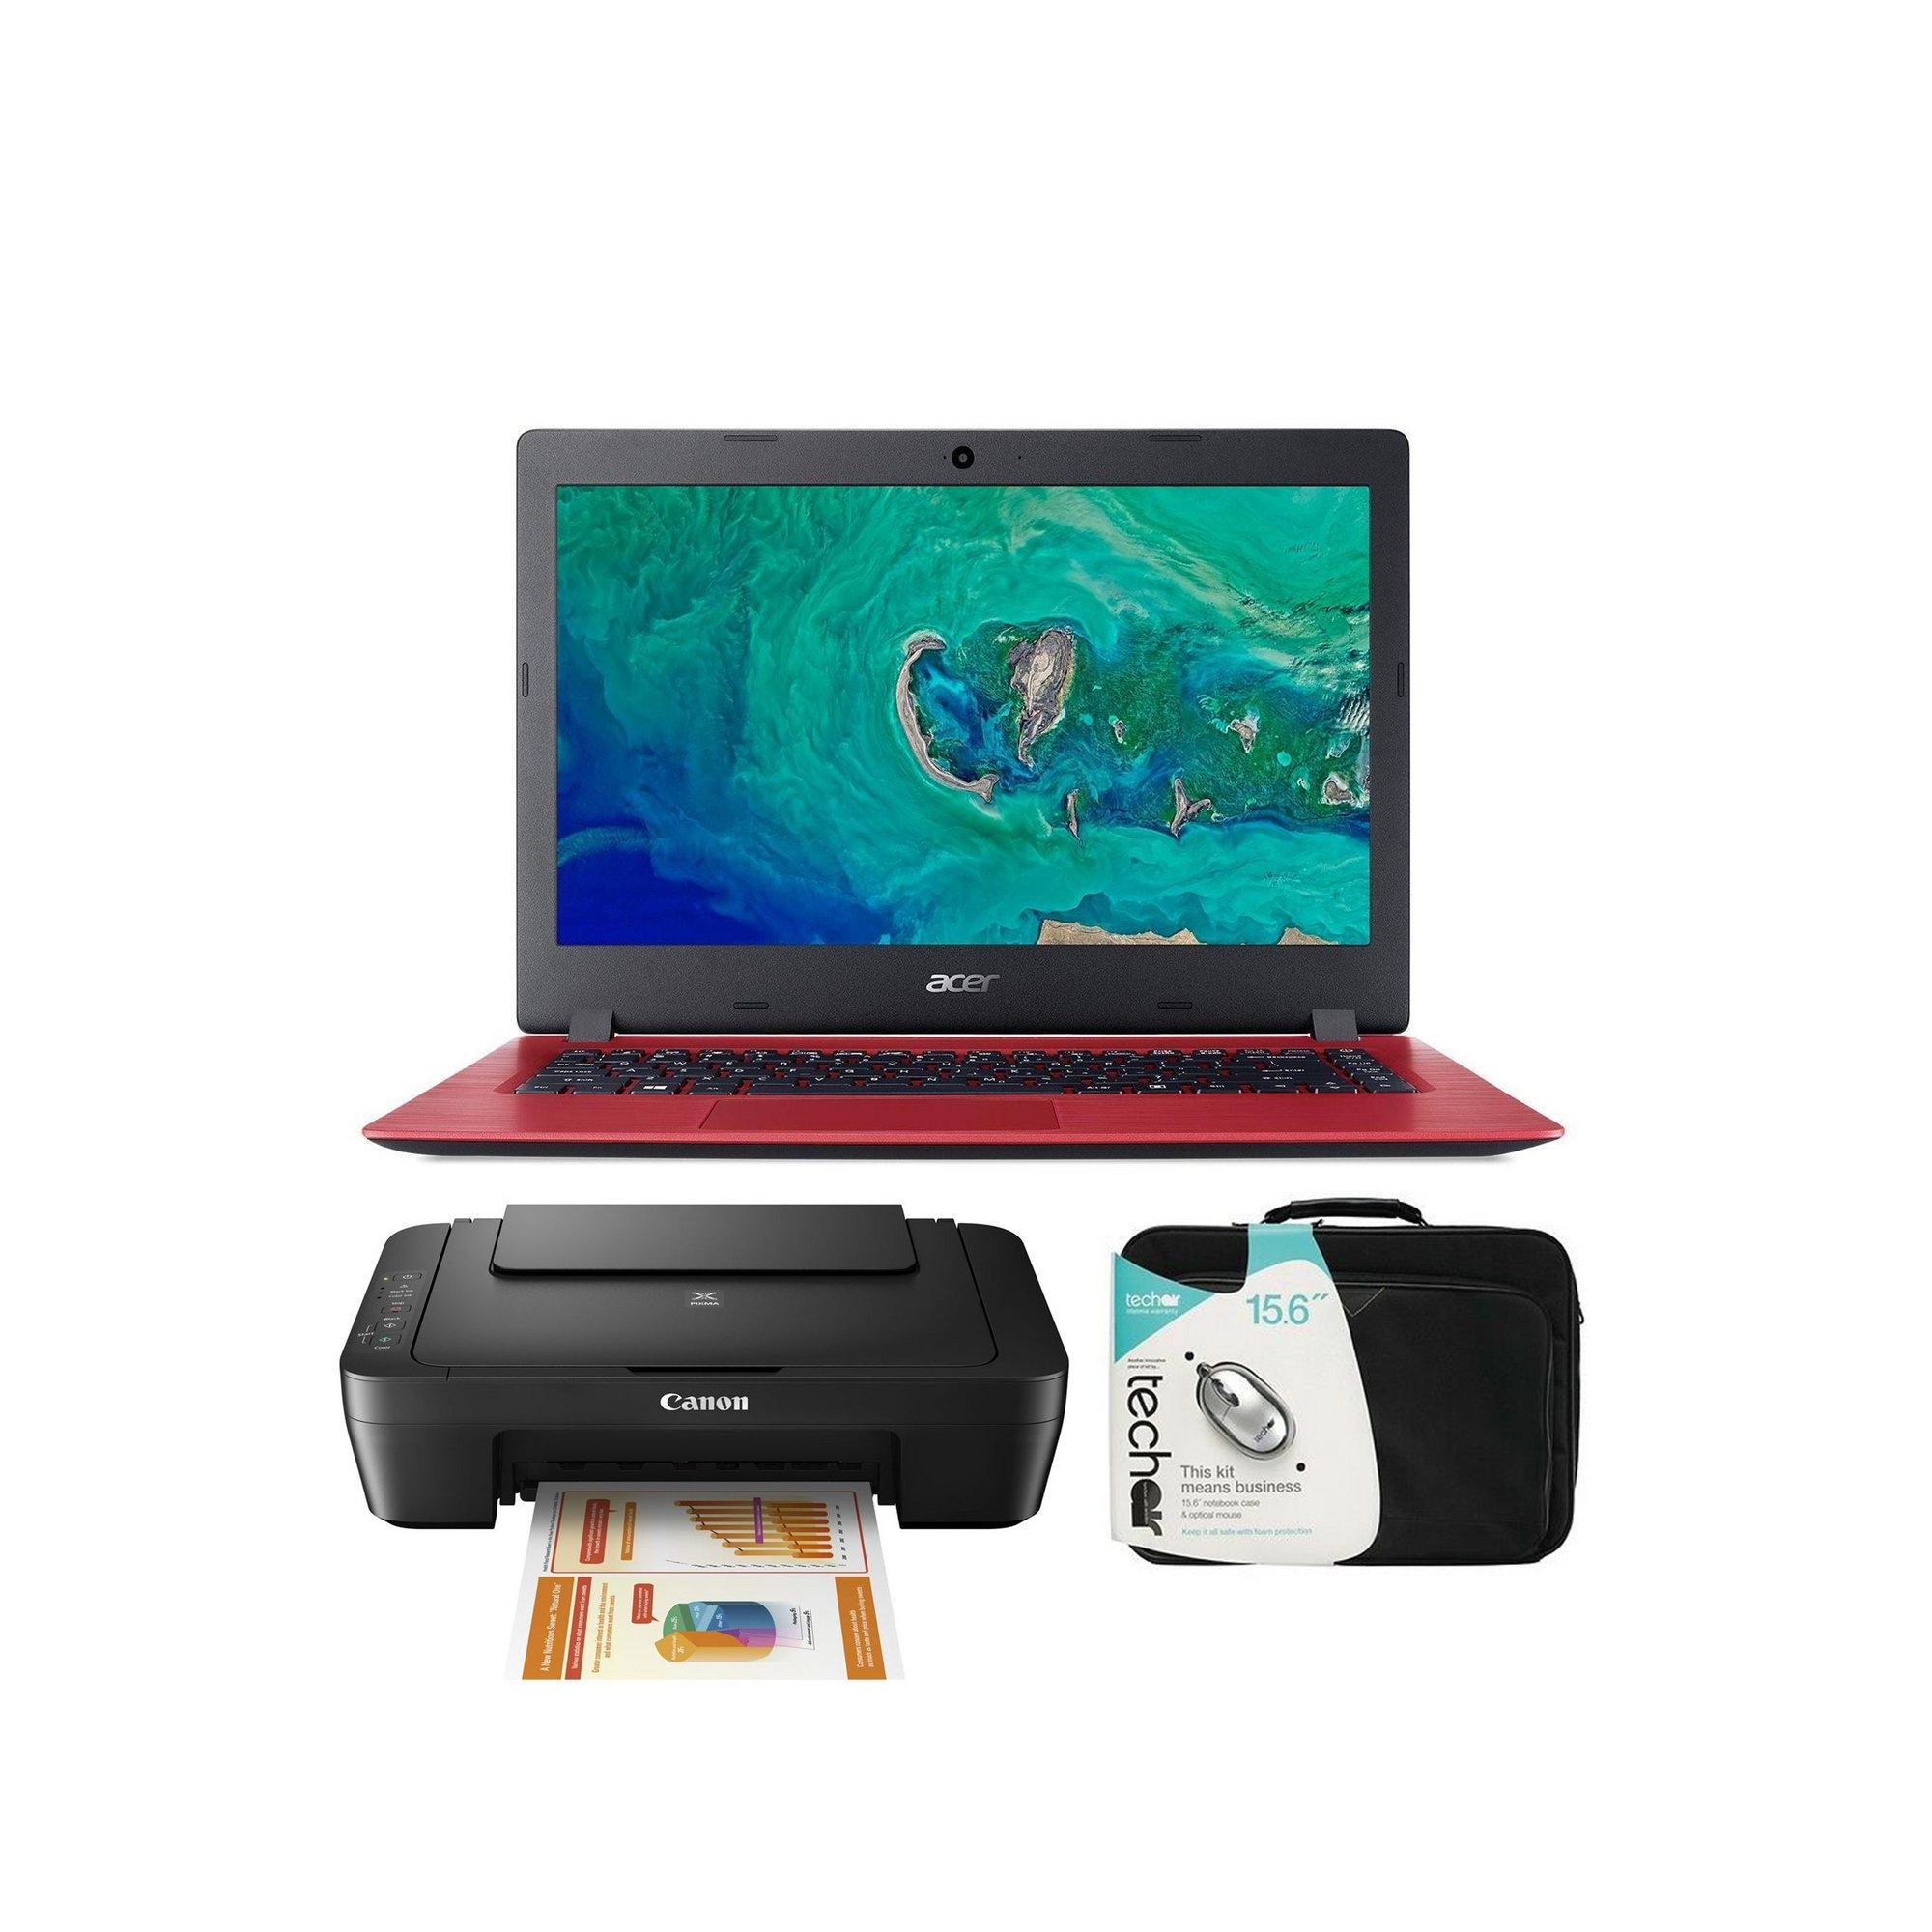 Image of Acer Aspire 1 14 Inch Windows 10 Home 4GB 64GB Laptop Printer Bundle